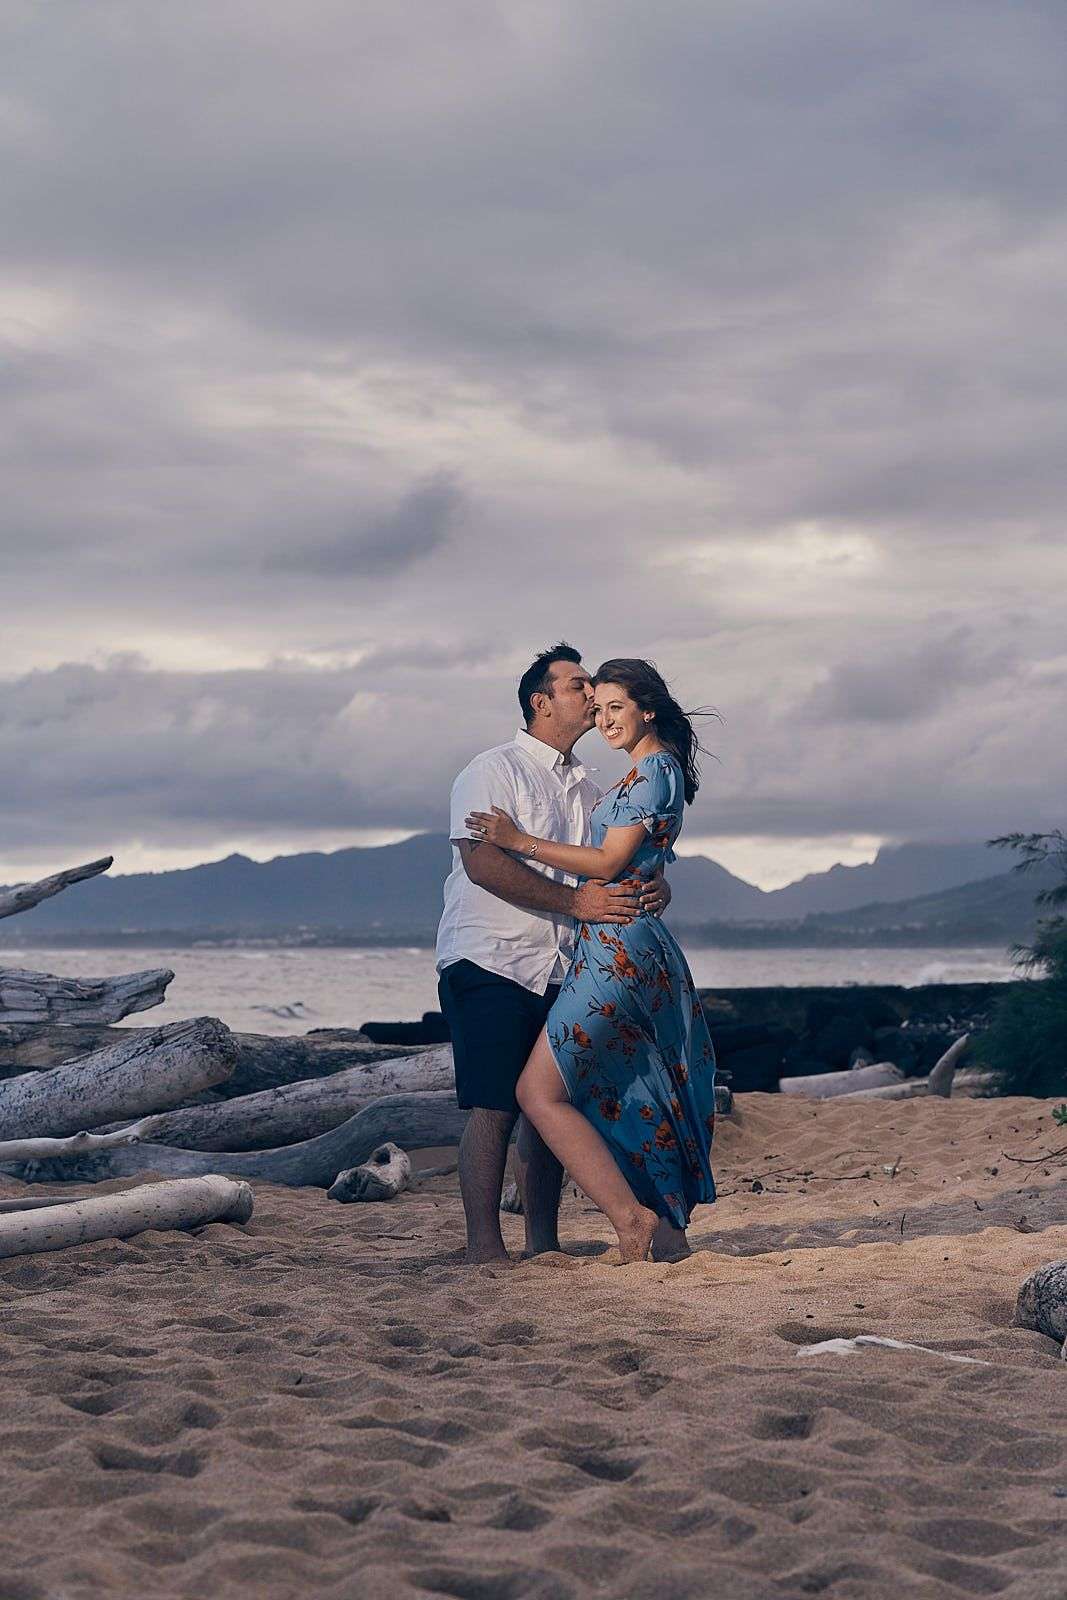 Engagement photoshoot in Kapaa Kauai by A Few Good Clicks